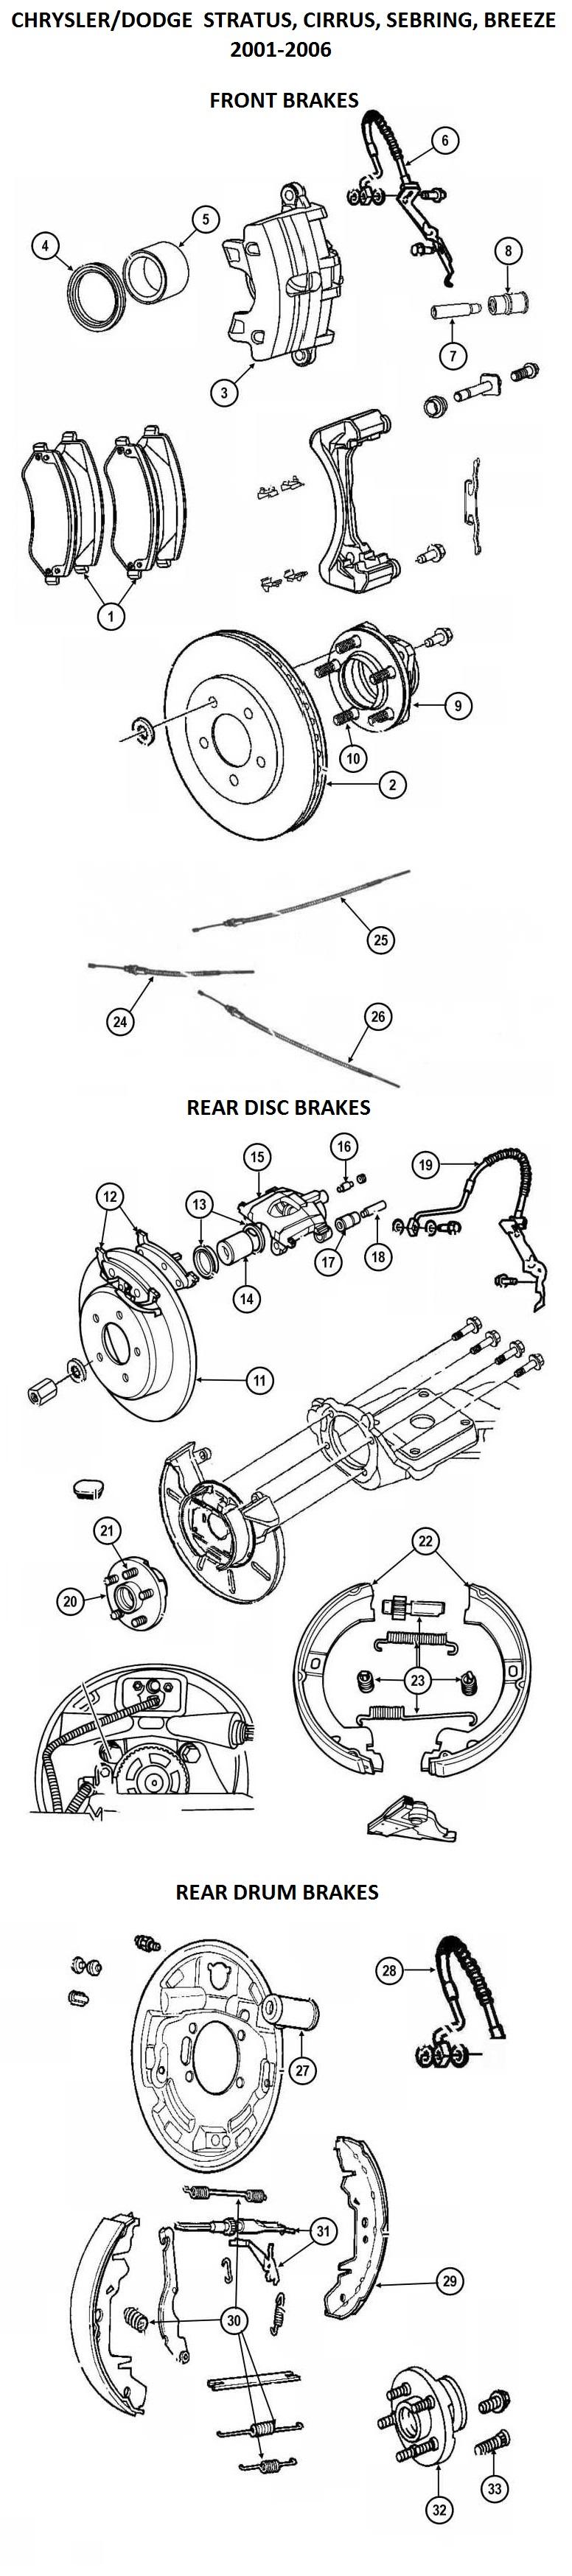 medium resolution of usauto parts for chrysler 2000dodgeneonenginediagram 2000 dodge neon engine diagram car